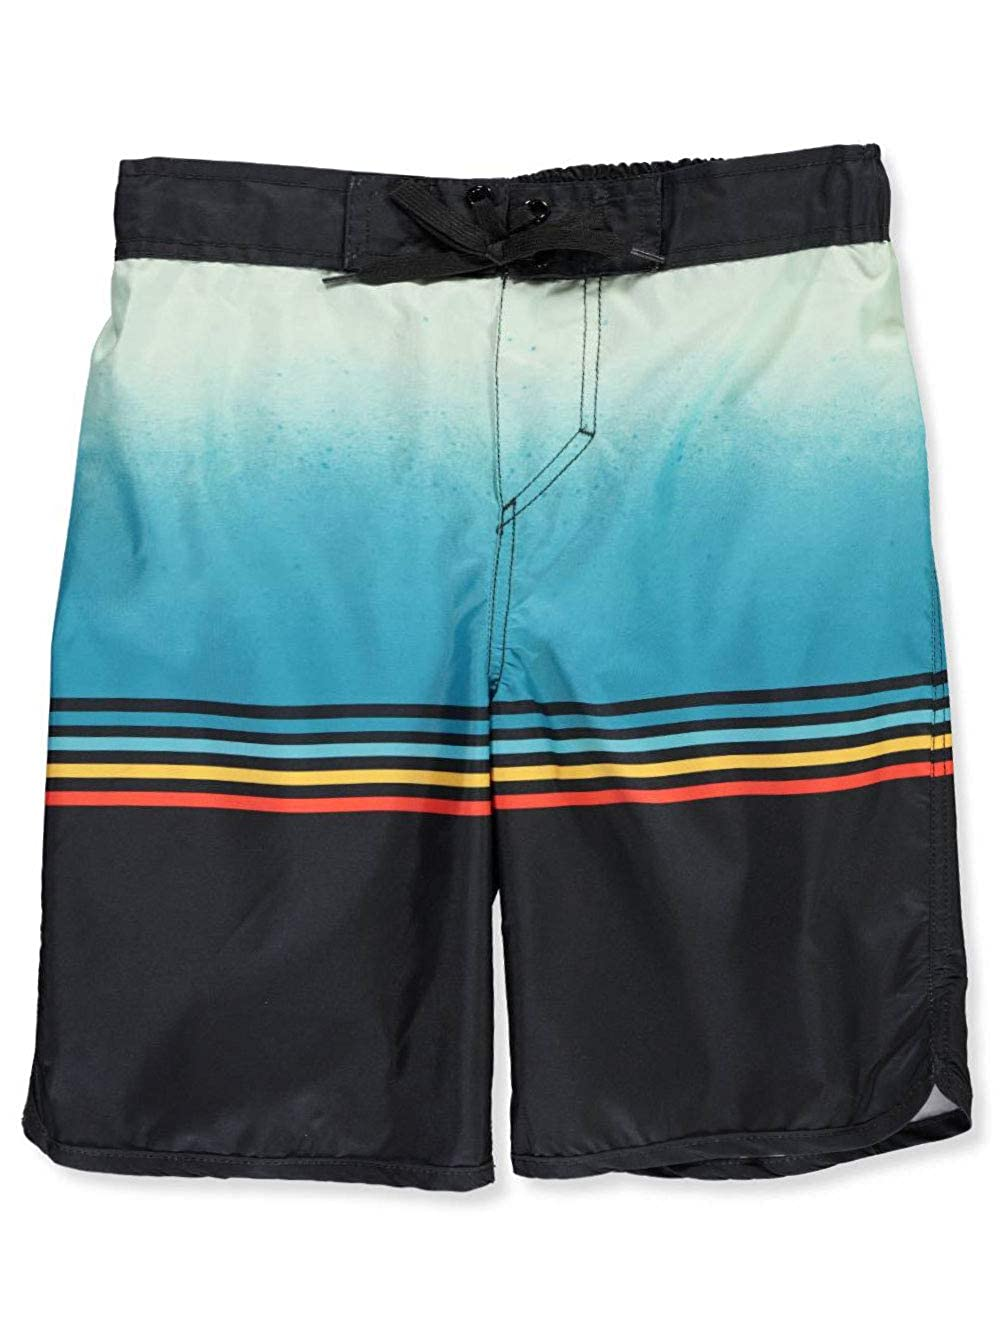 Rusty Boys Board Shorts